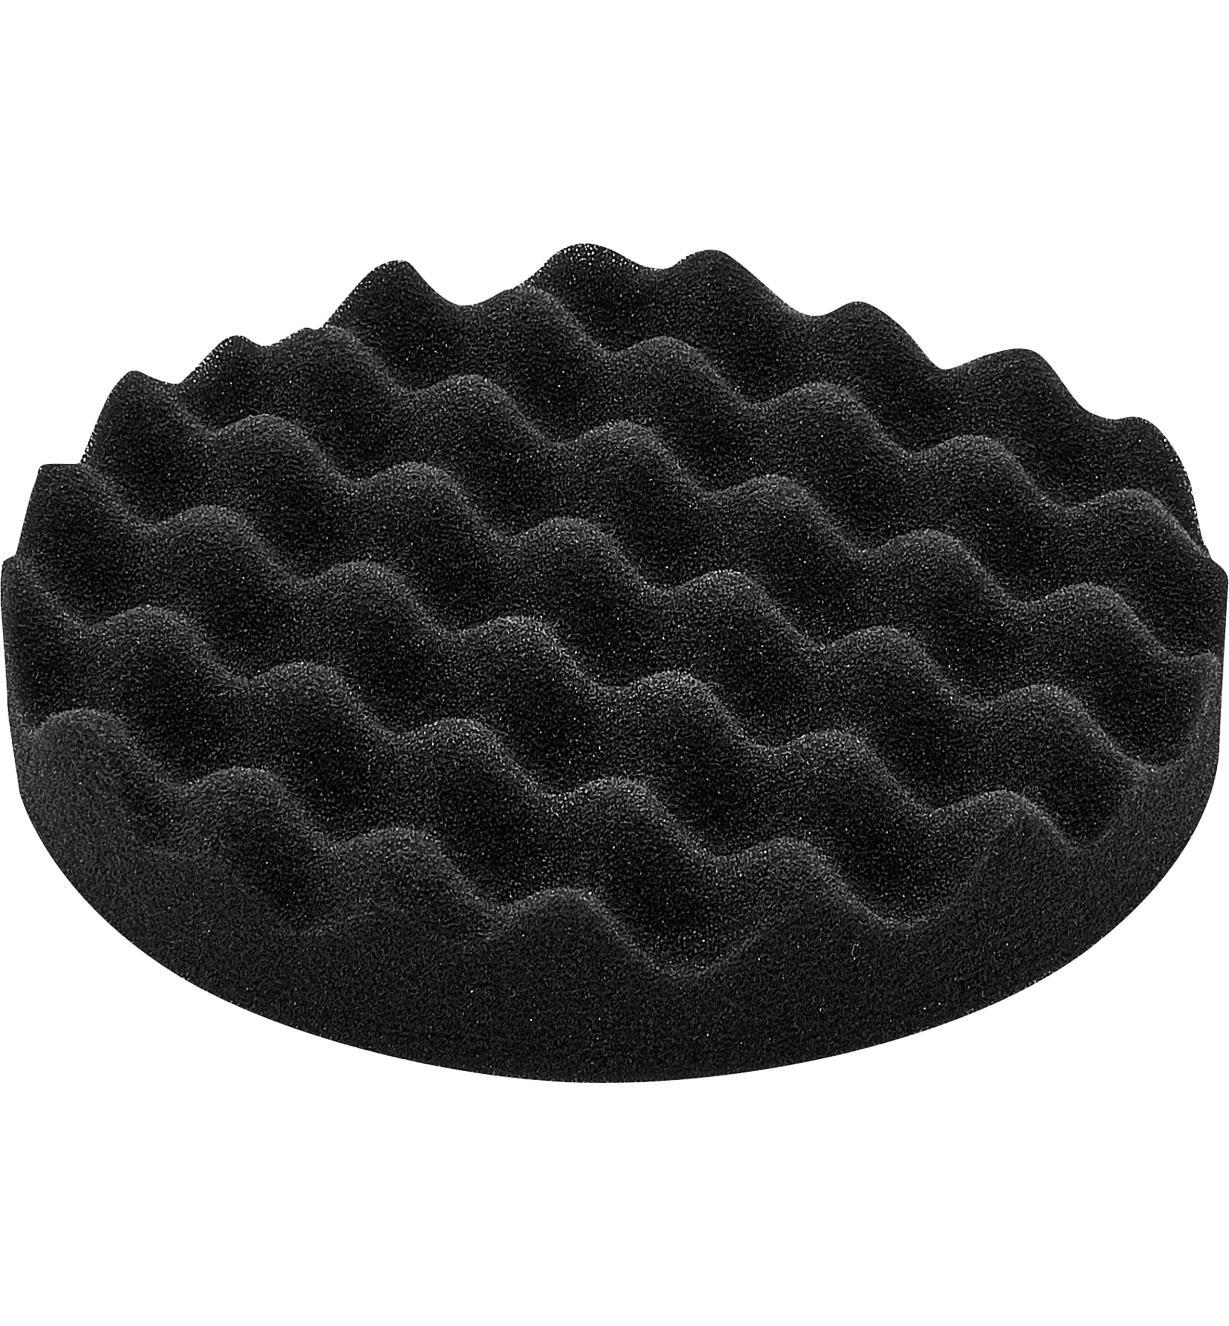 Black 150mm Polishing Sponge